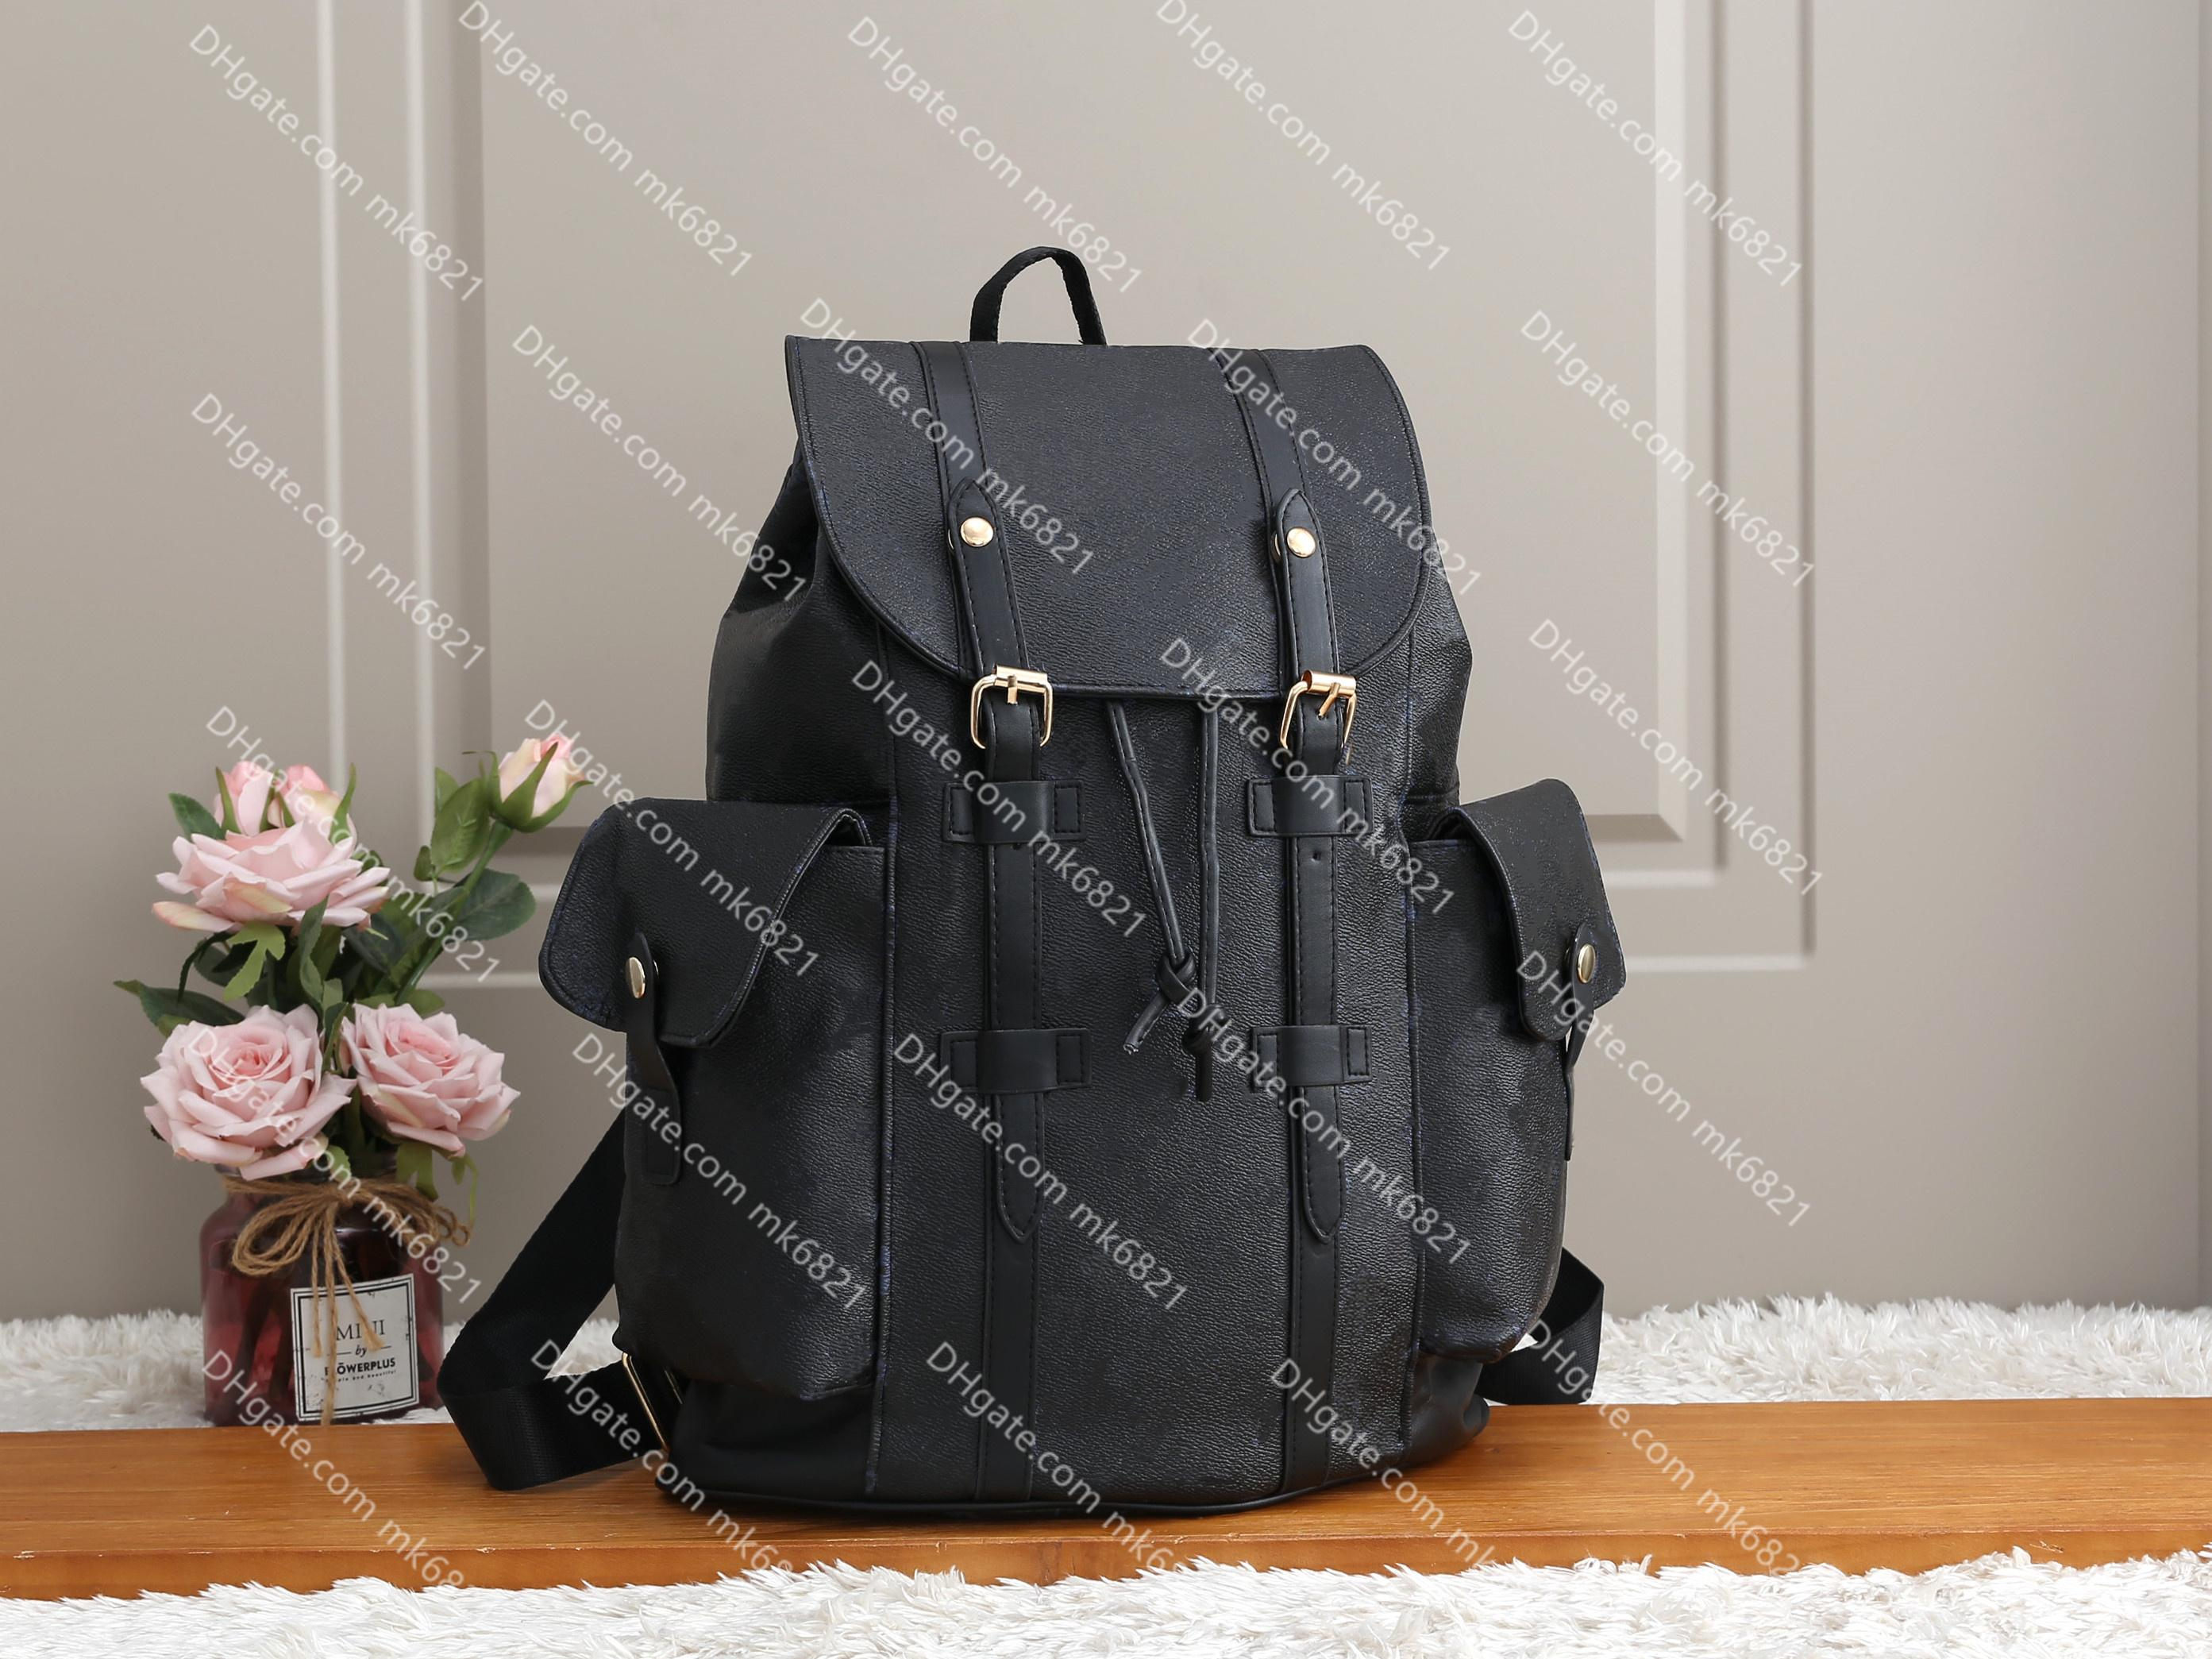 Couro christopher mochila luxo designer masapsack homens mulheres mochilas flores e xadrez moda schoolbag mochila pack back